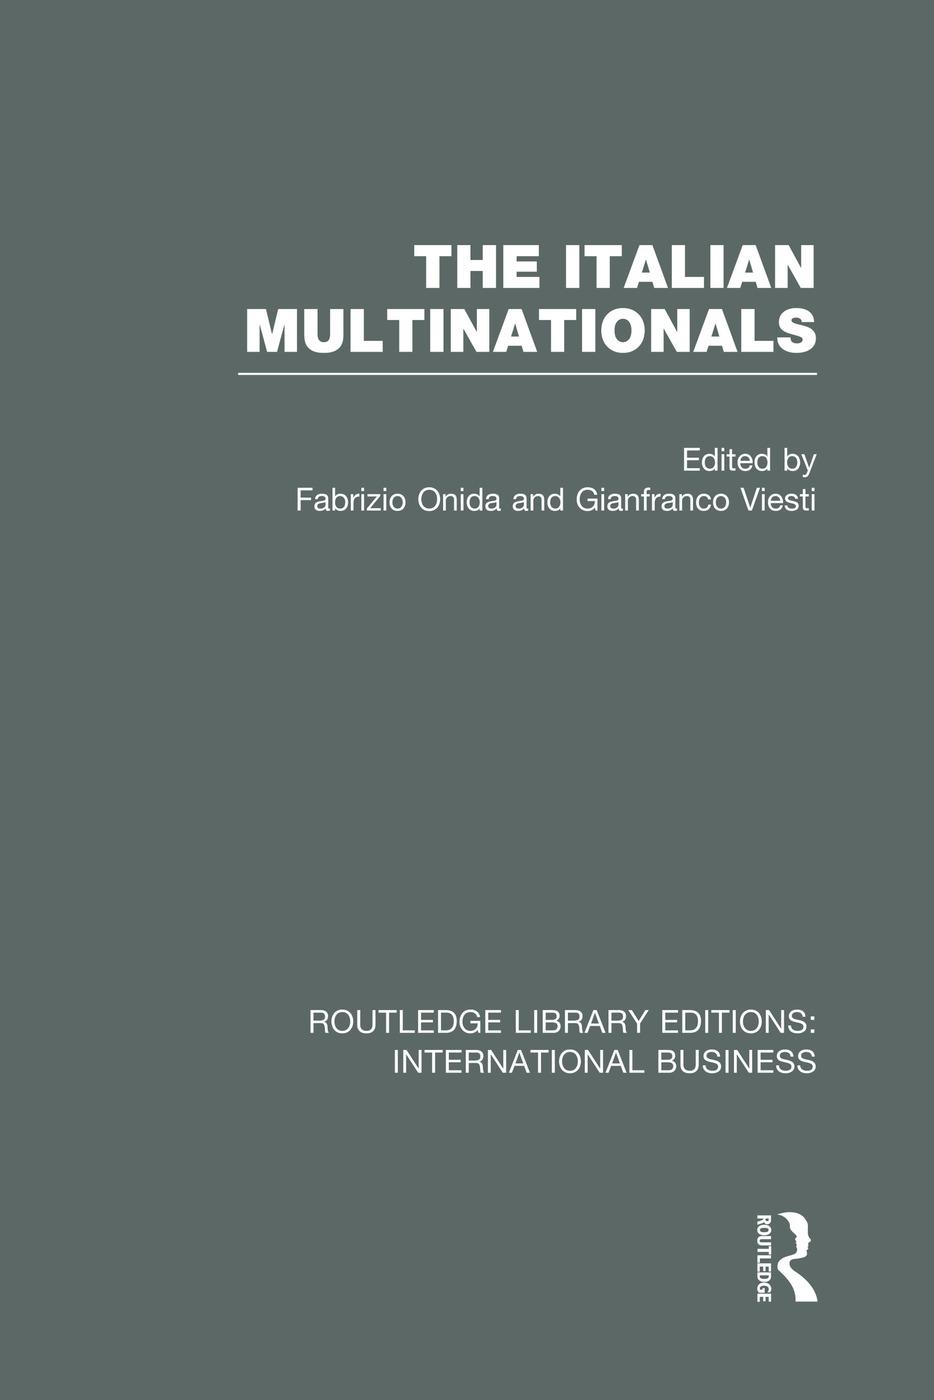 The Italian Multinationals (RLE International Business)